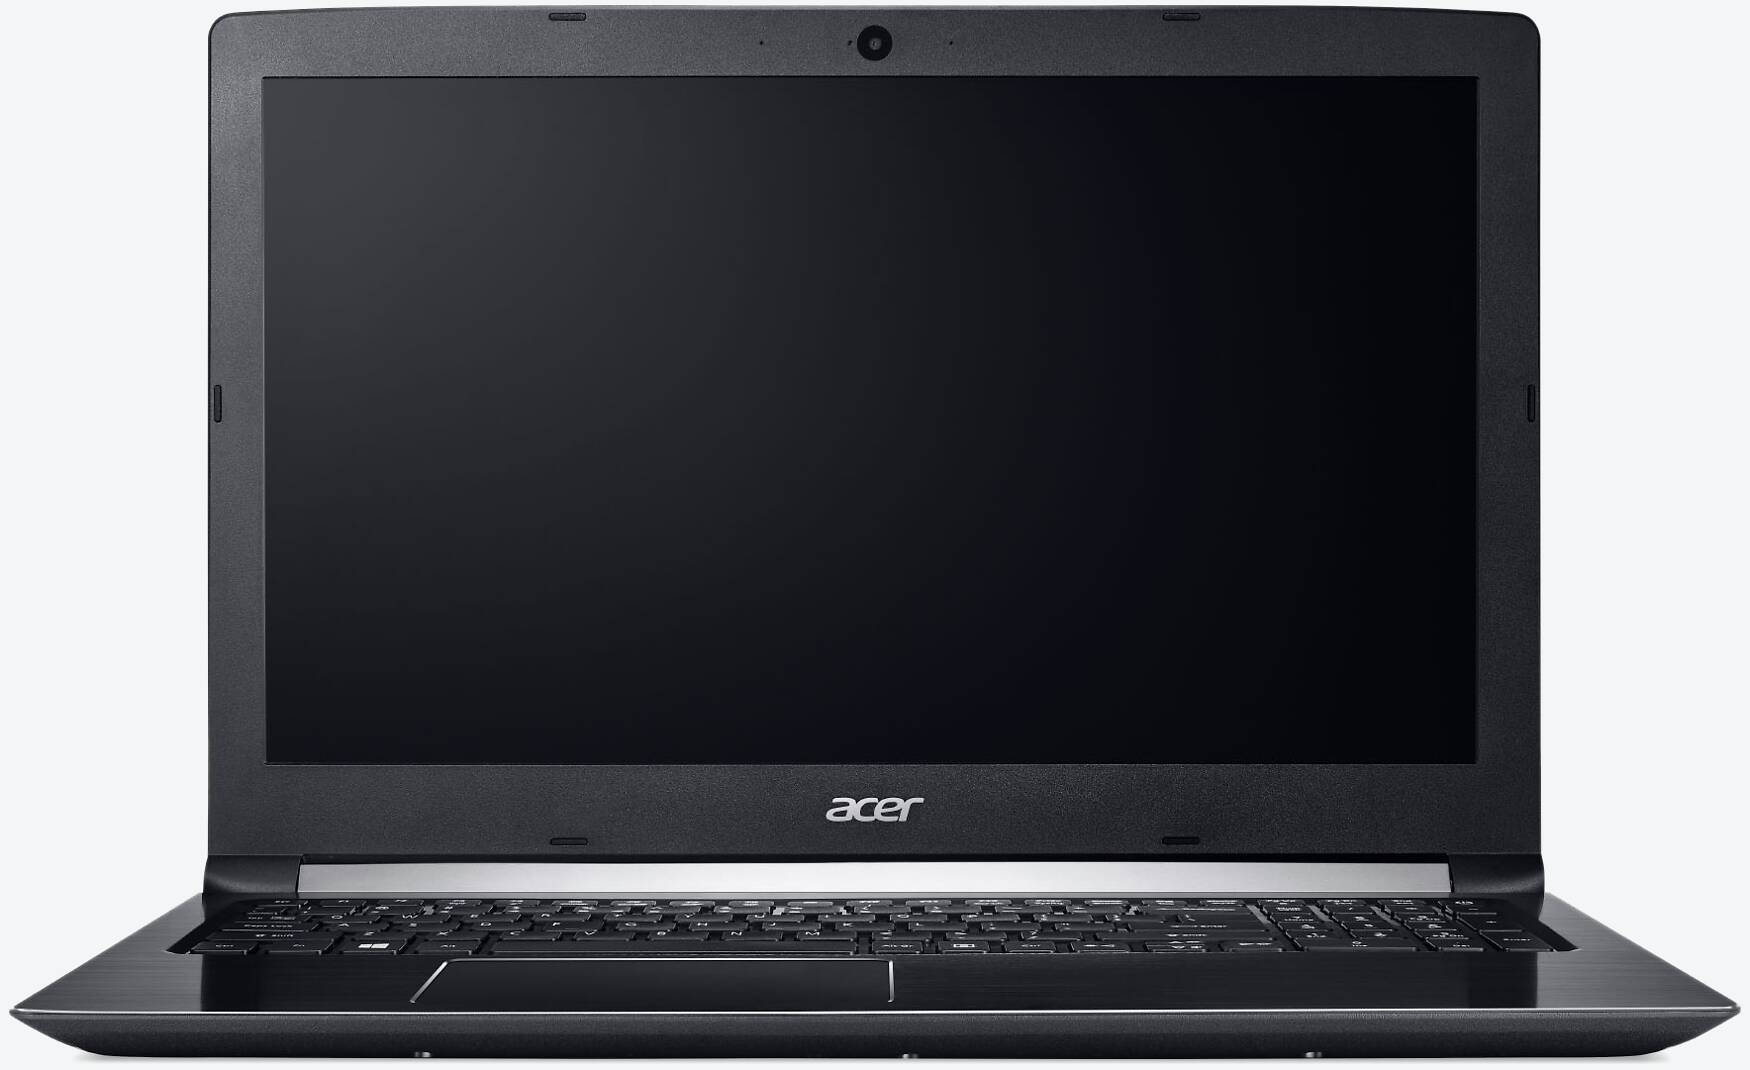 Acer Aspire 5 A517-51G-51MQ